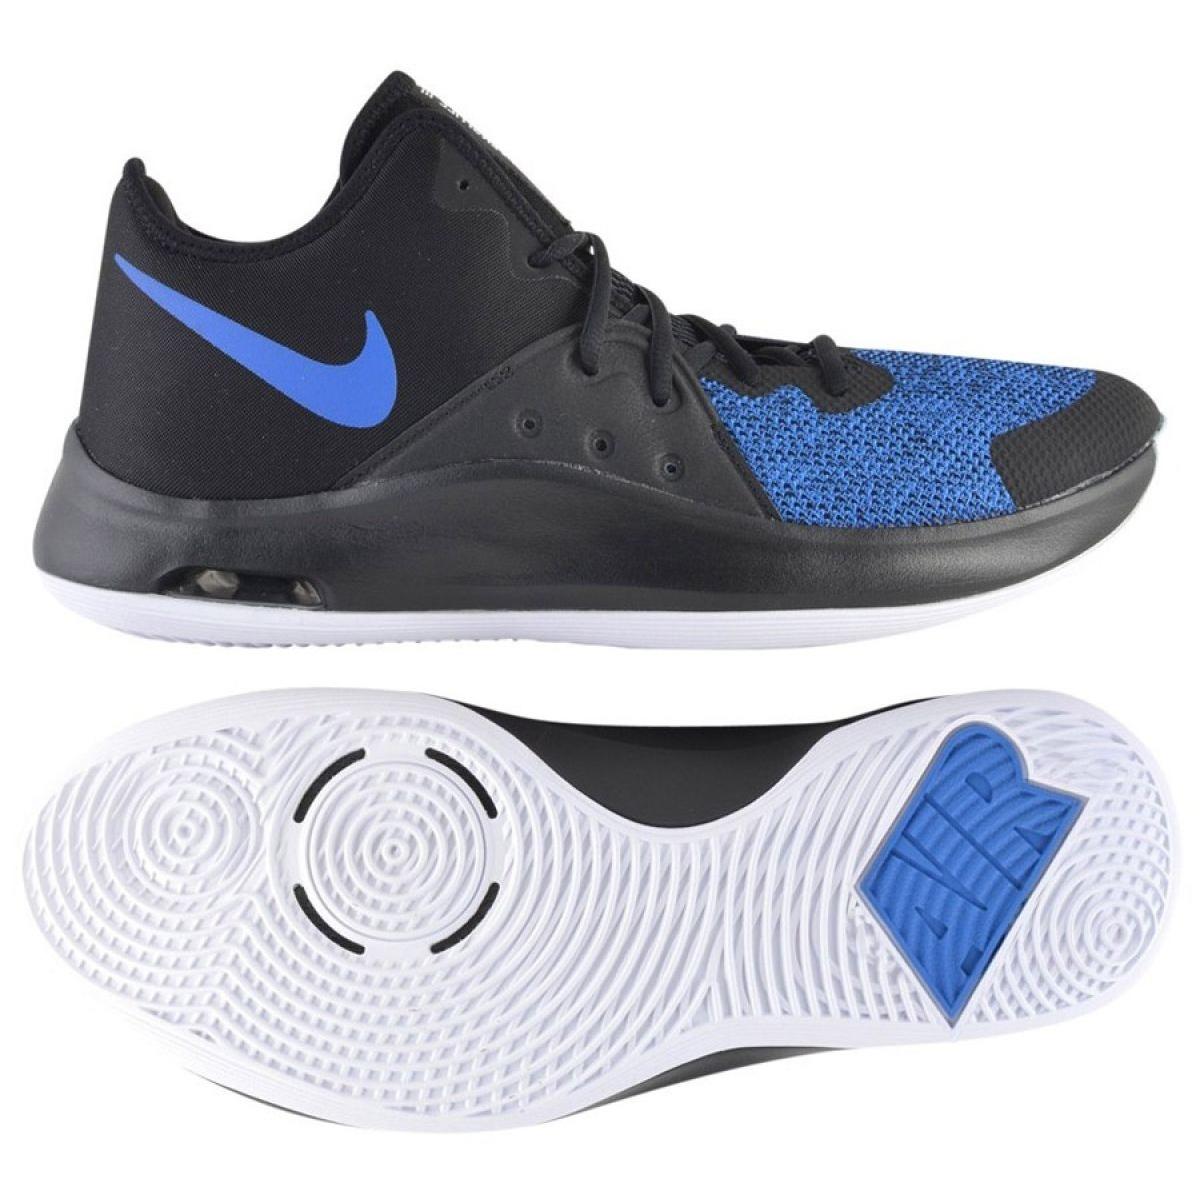 5853eeac0d45d Basketbalové boty Nike Air Versitile Iii M AO4430-004 - ButyModne.pl